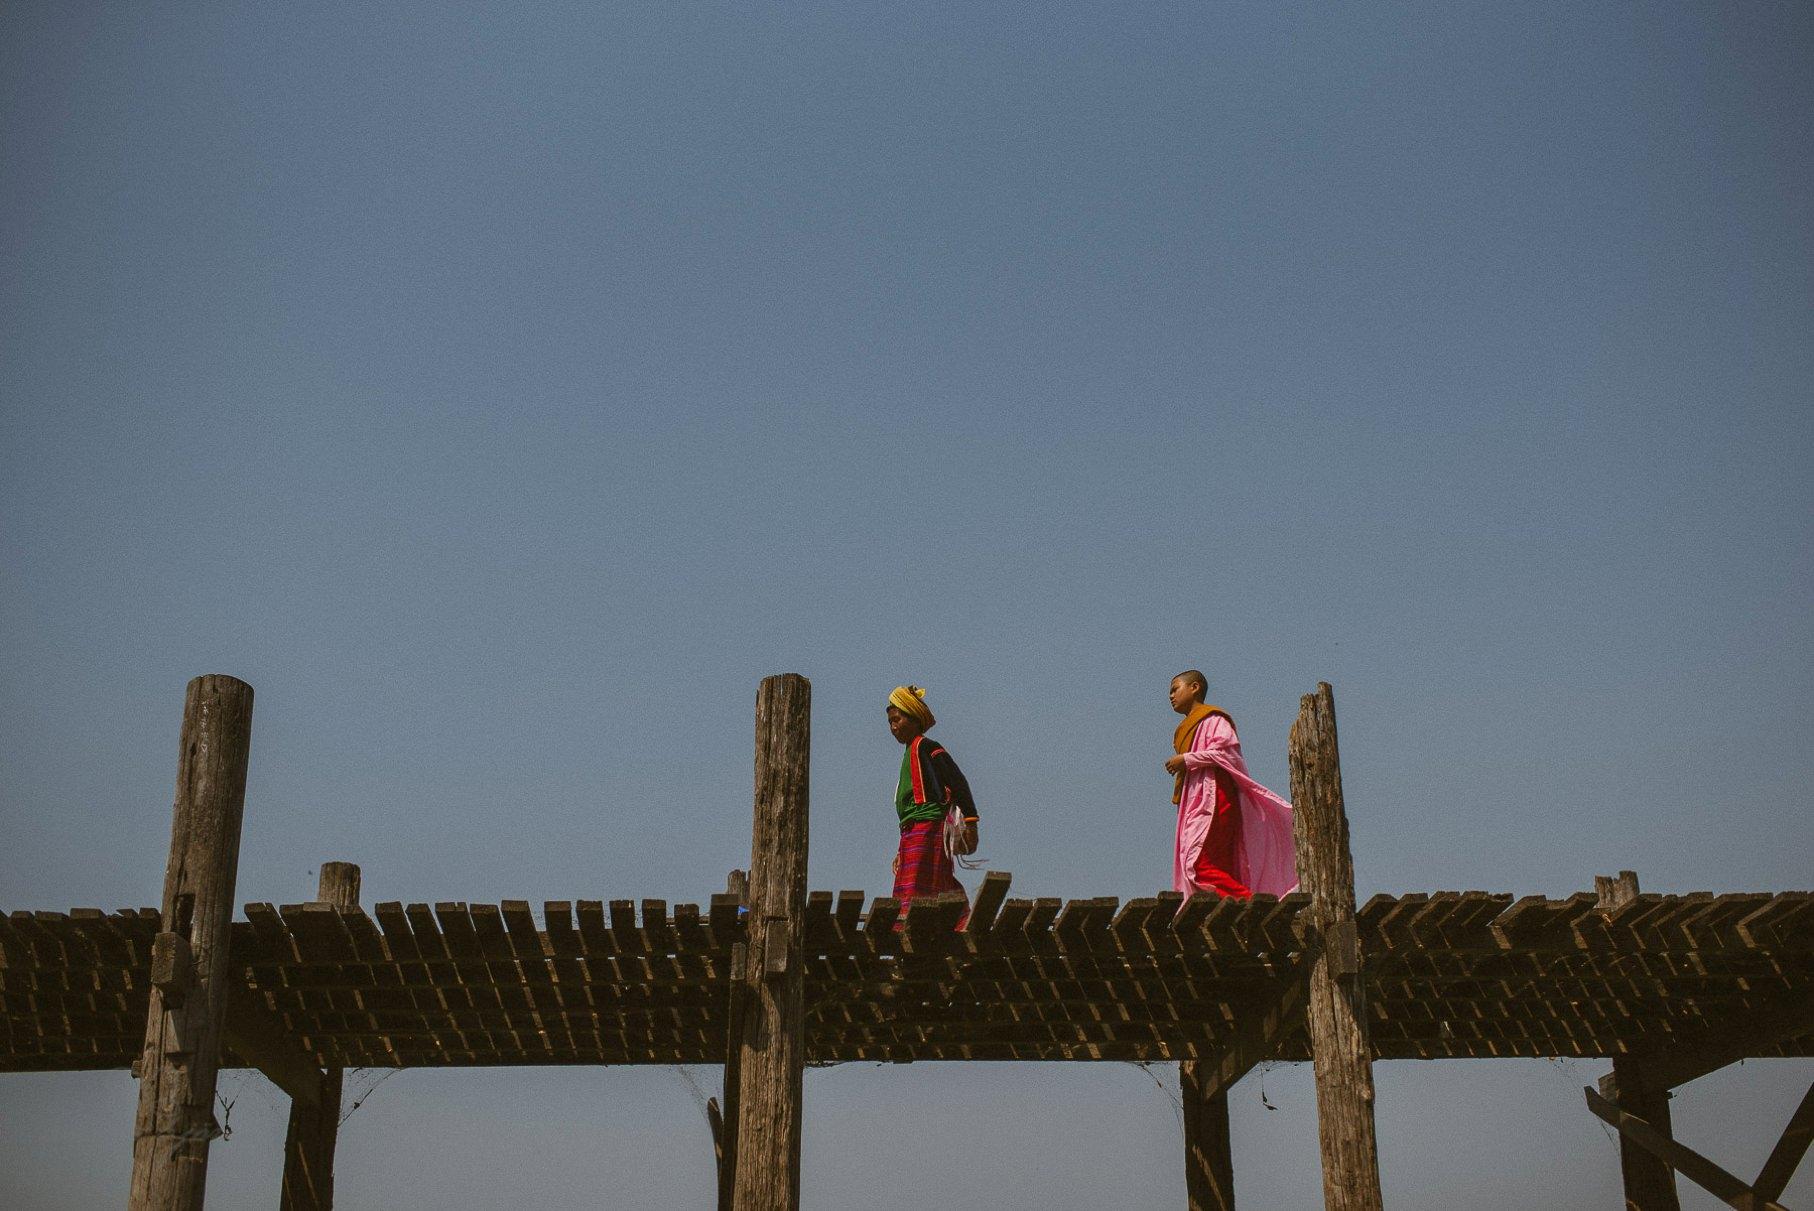 0054 yangon mandalay d76 6850 - Großstädte Myanmars - Yangon & Mandalay